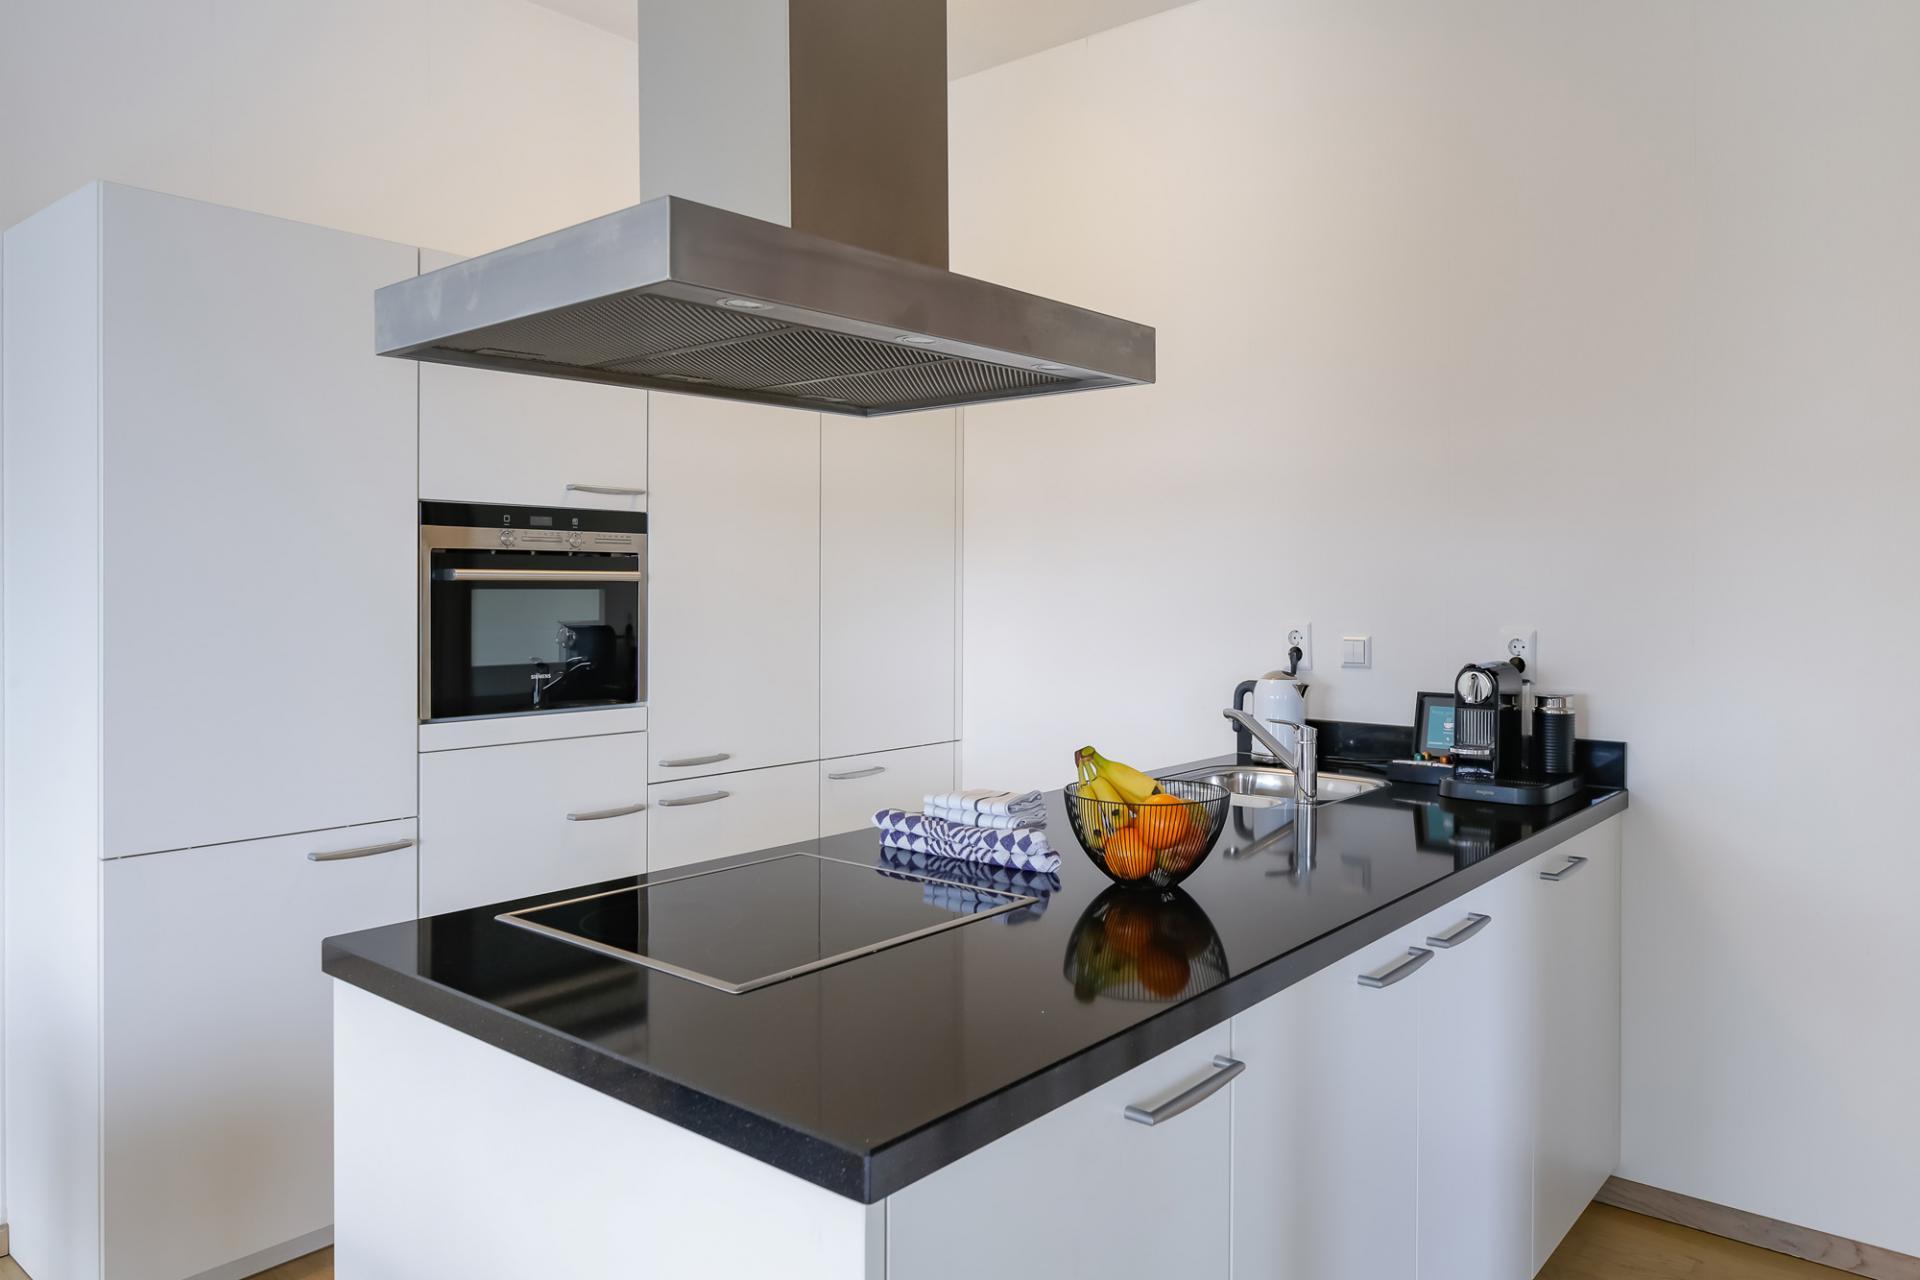 Kitchen at New Orleans Apartments, Kop Van Zuid, Rotterdam - Citybase Apartments